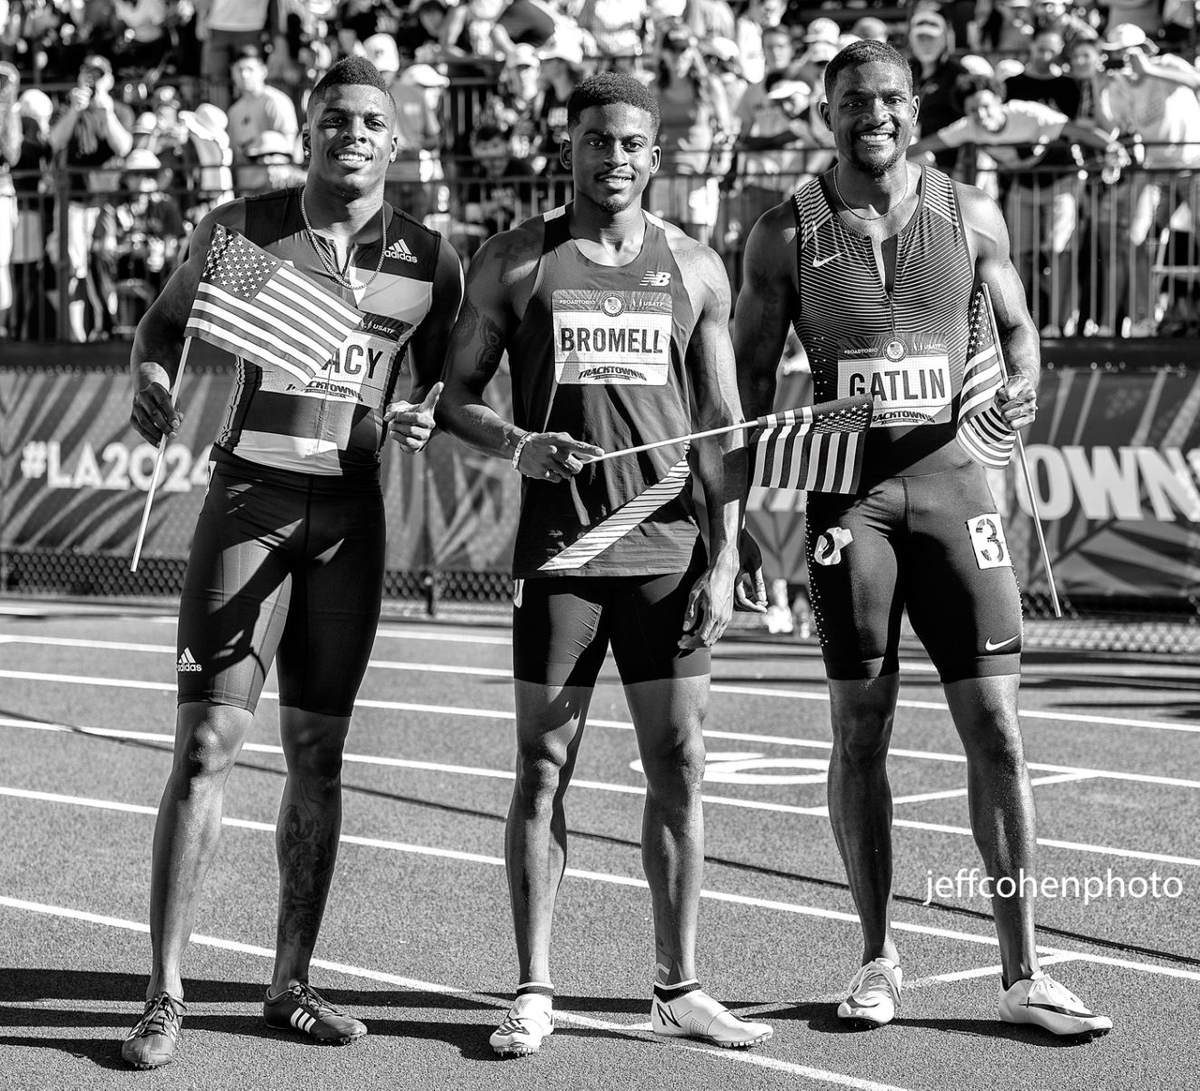 1r2016_oly_trials_day_3_100m_winners_jeff_cohen_photo_11565_web.jpg